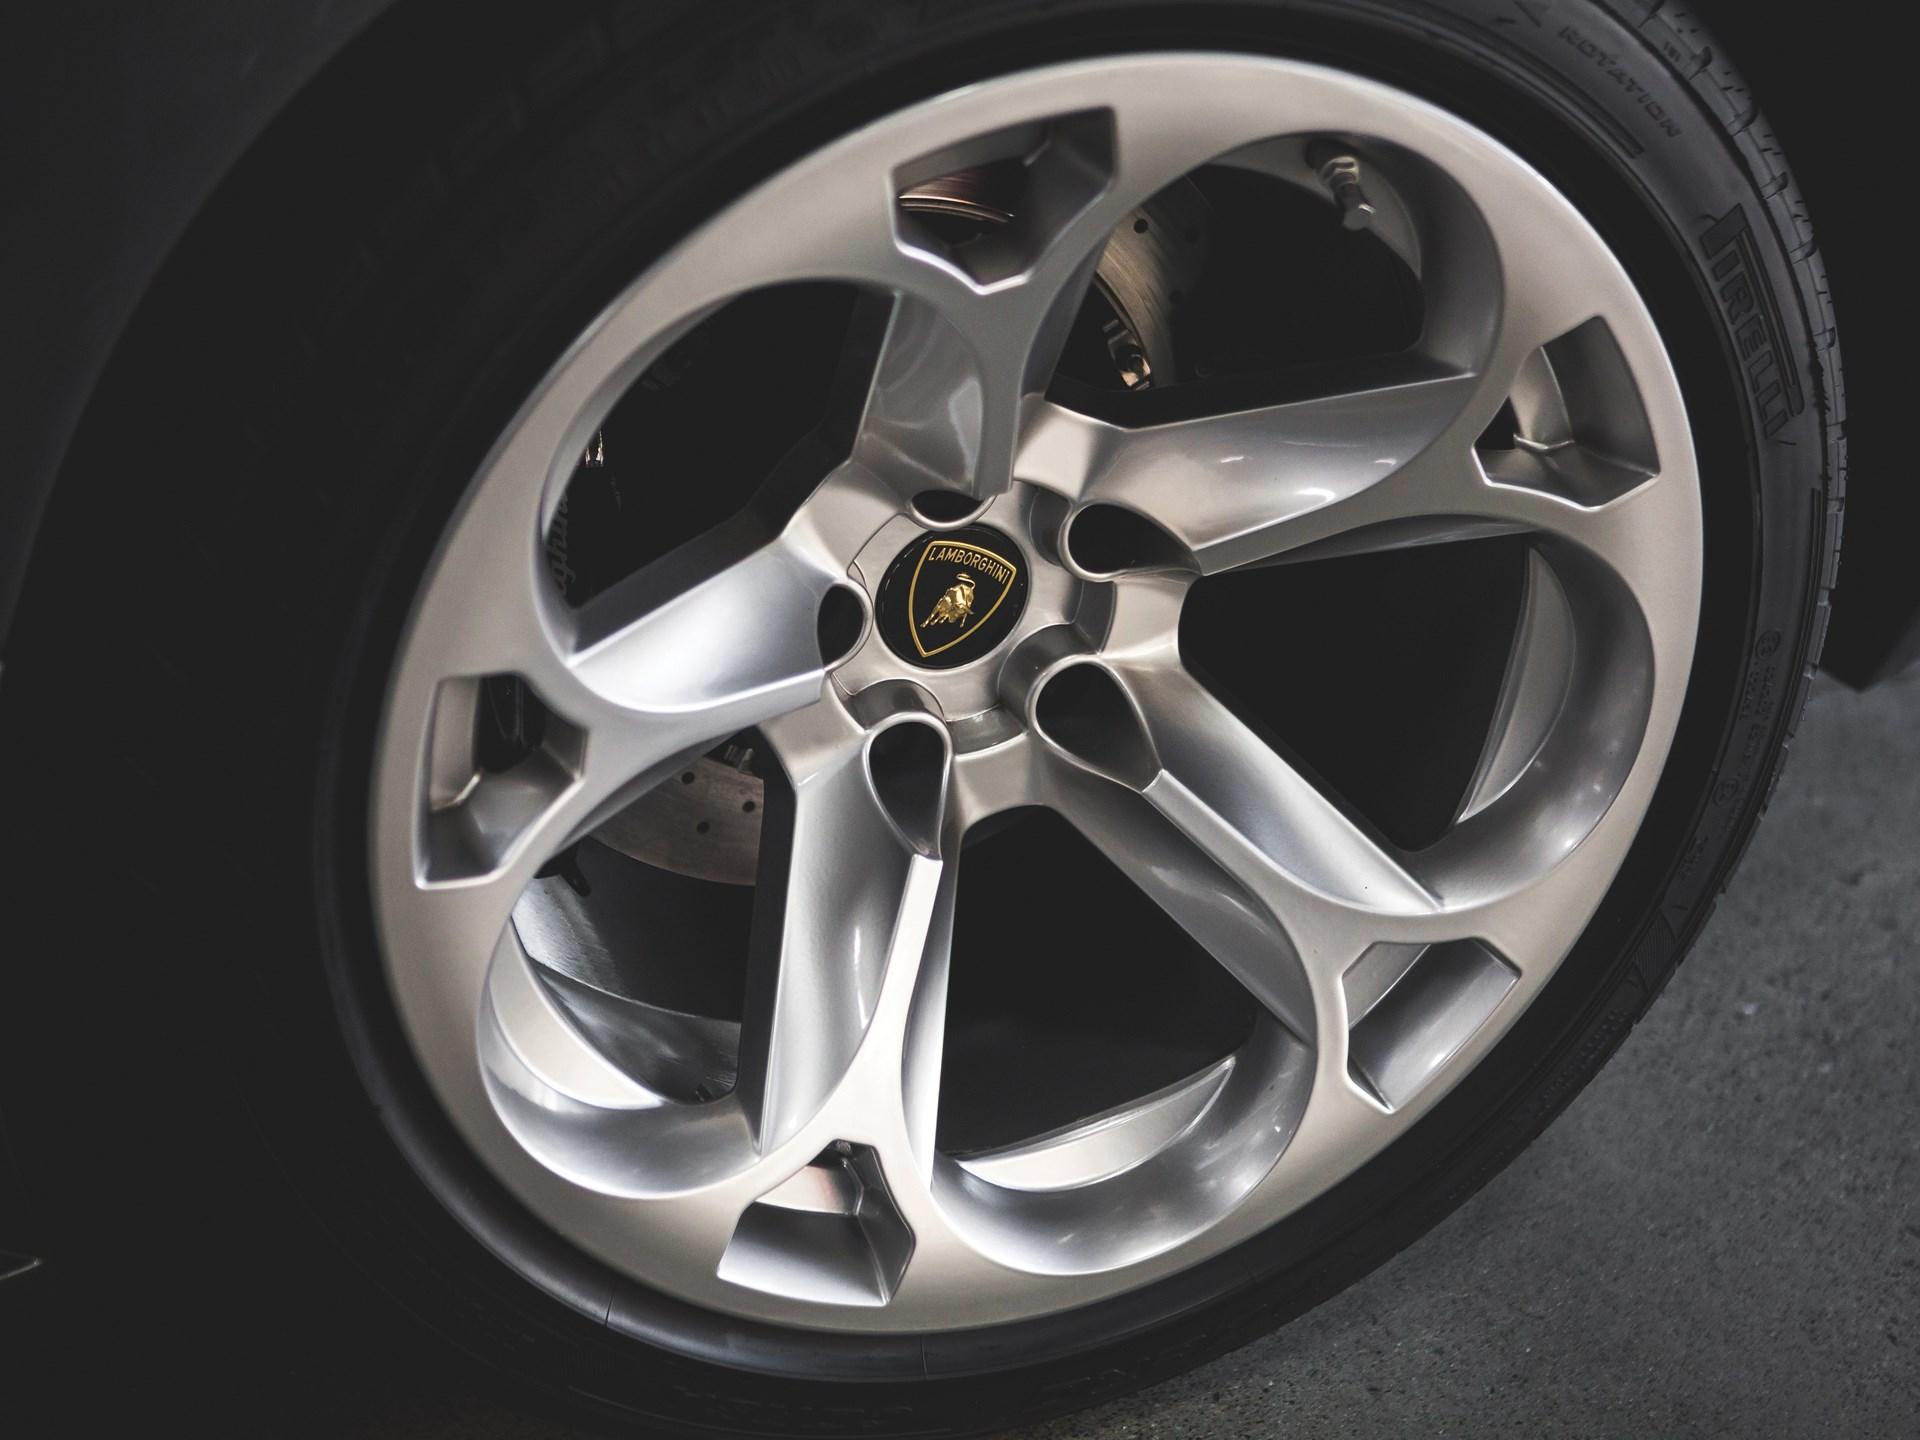 2008 Lamborghini Murciélago LP640 Roadster